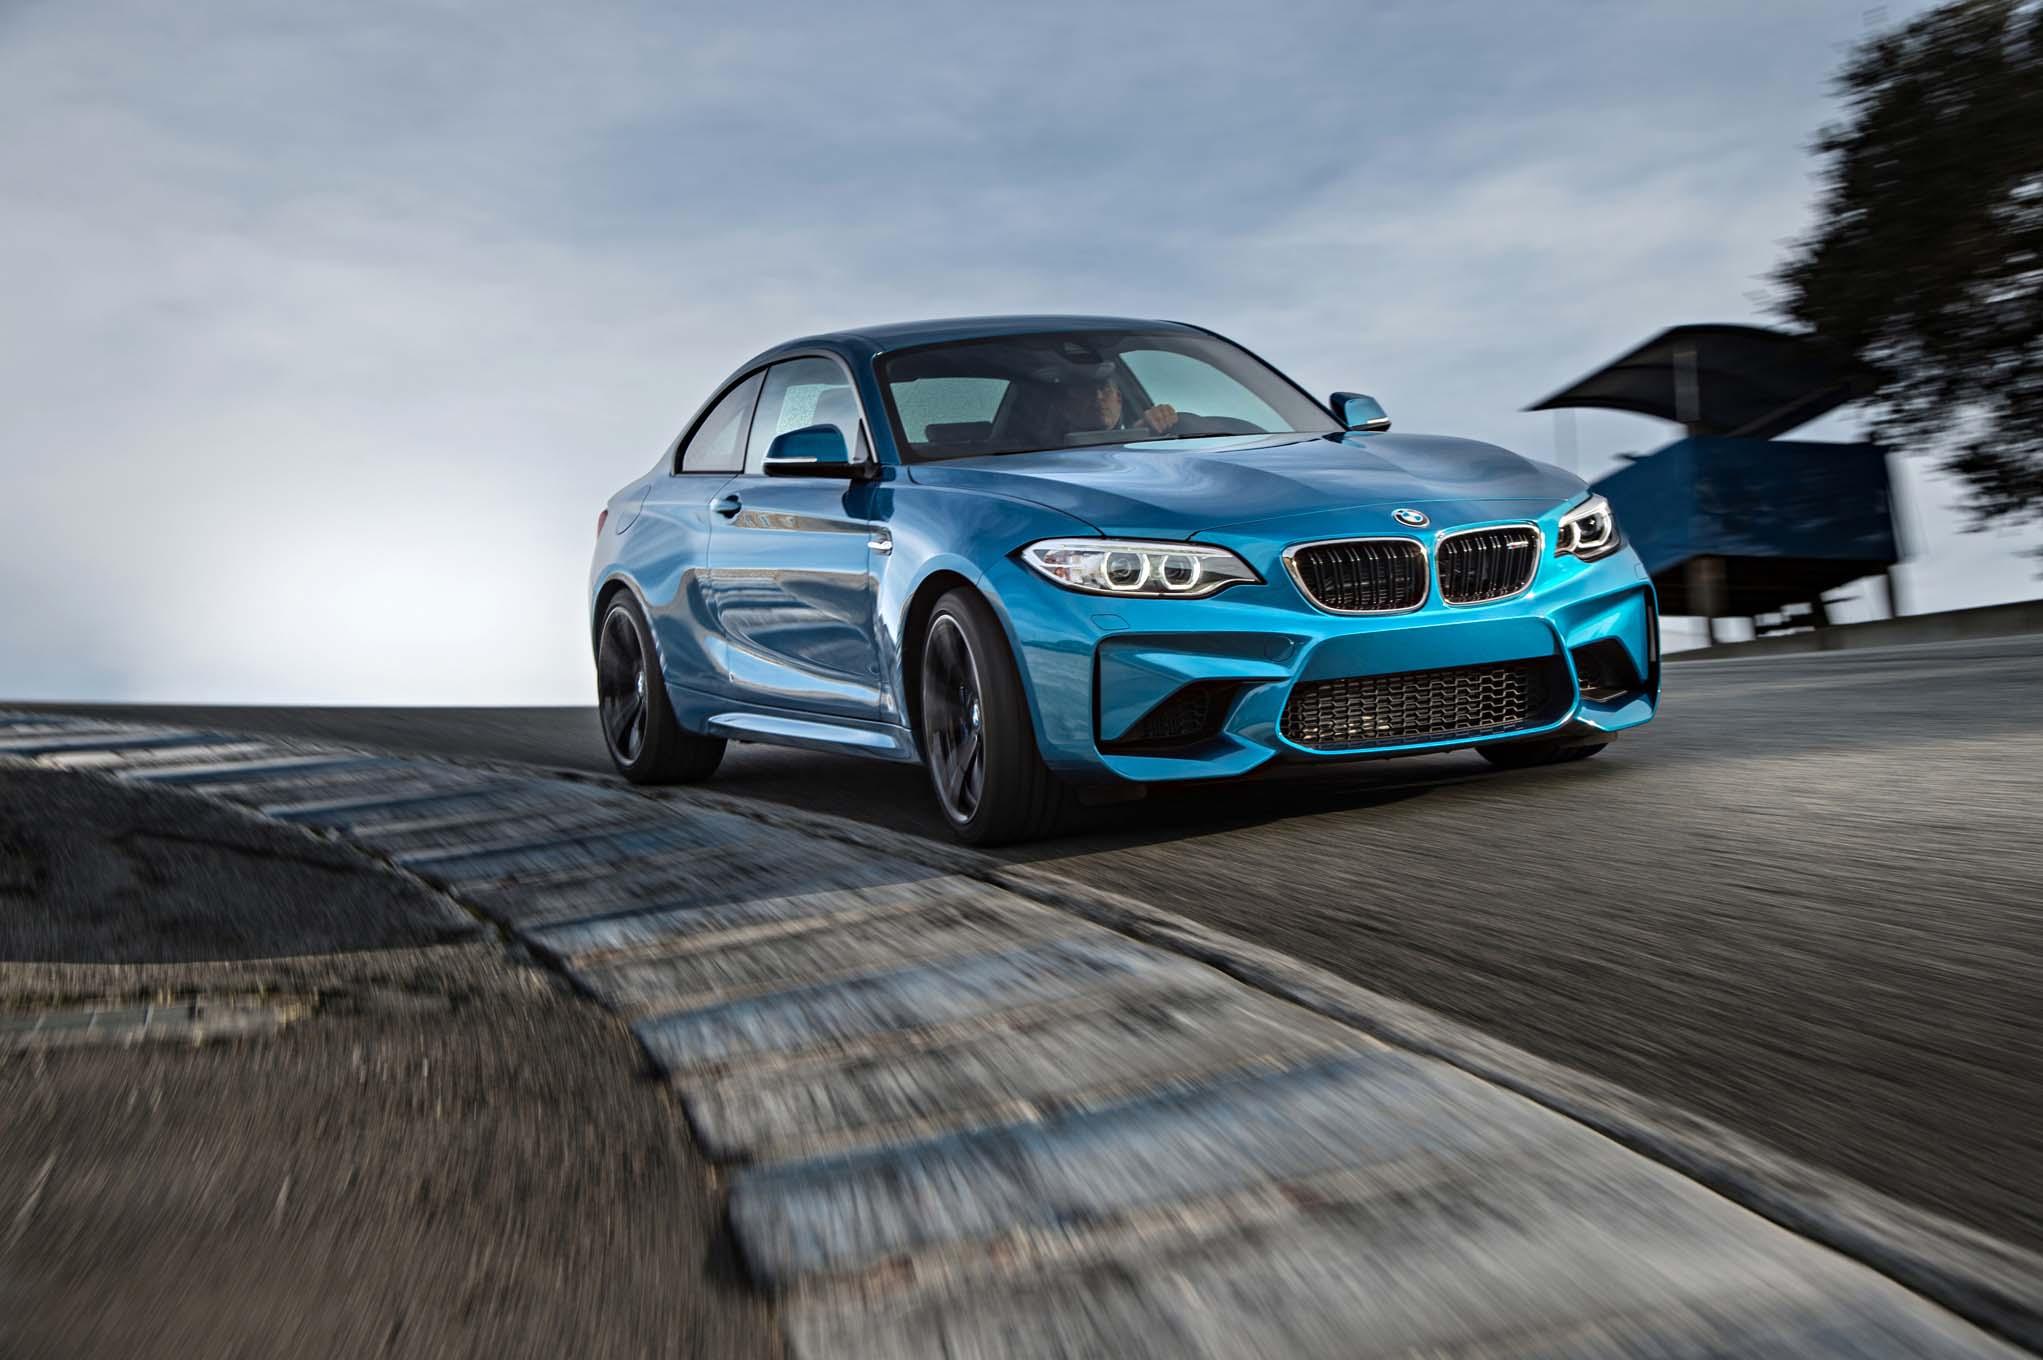 BMW ให้โชคใหญ่ เมื่อซื้อบีเอ็มดับเบิ้ลยูทุกรุ่นวันนี้มีสิทธิได้ลุ้นรับ BMW M2 Coupe 2016